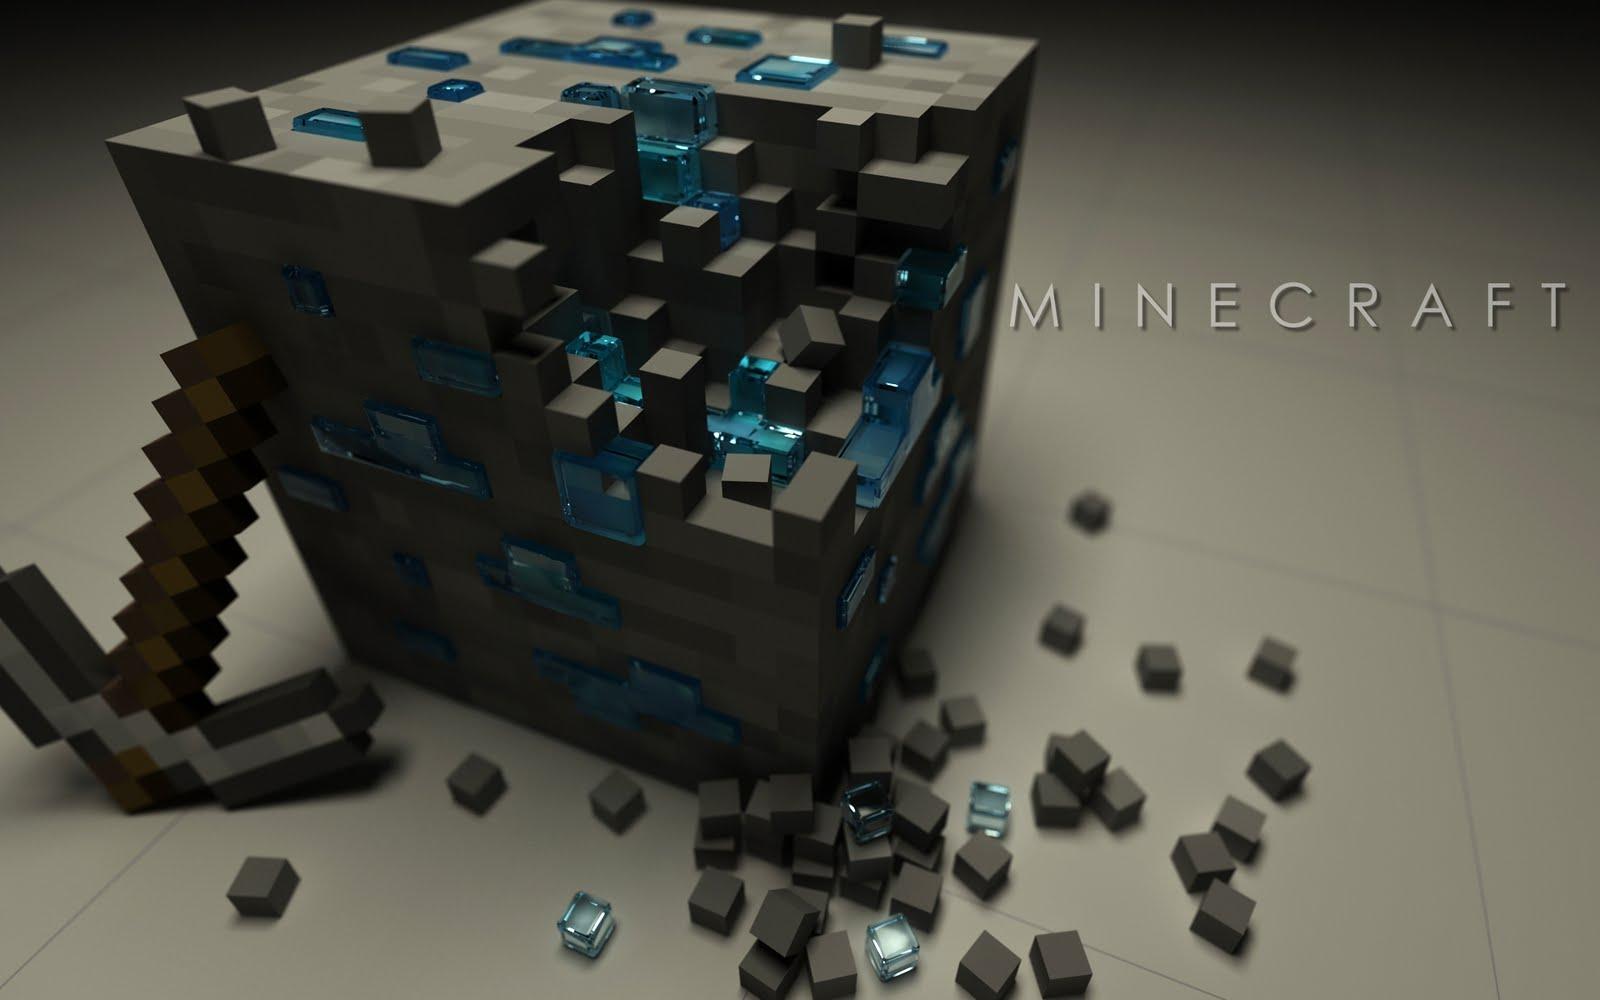 http://3.bp.blogspot.com/--NZnSGNVCSA/Tb7uZcOpnqI/AAAAAAAAABc/uiuIwM3KpSY/s1600/minecraft-wallpaper.jpg